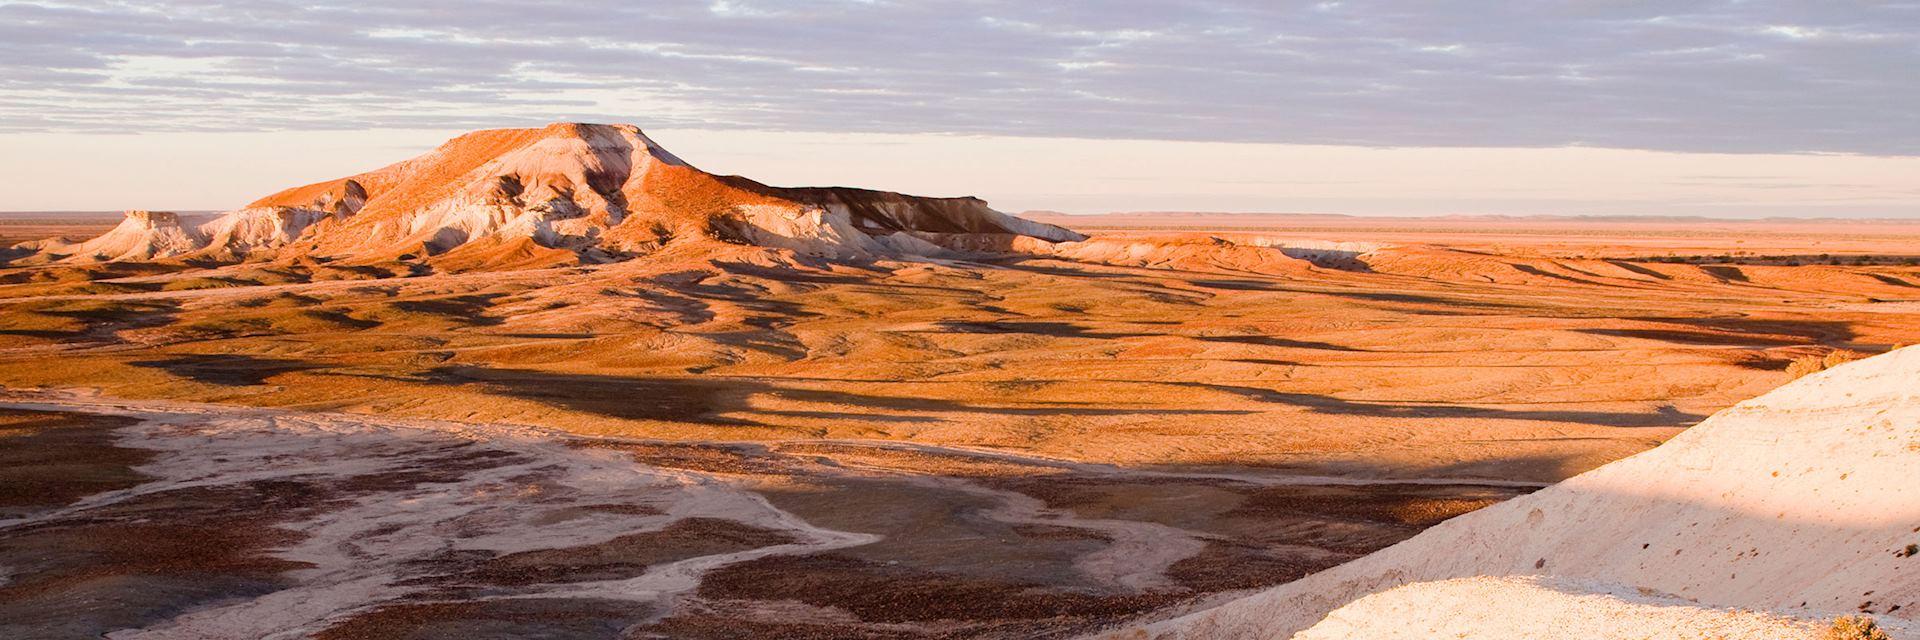 Australia's outback